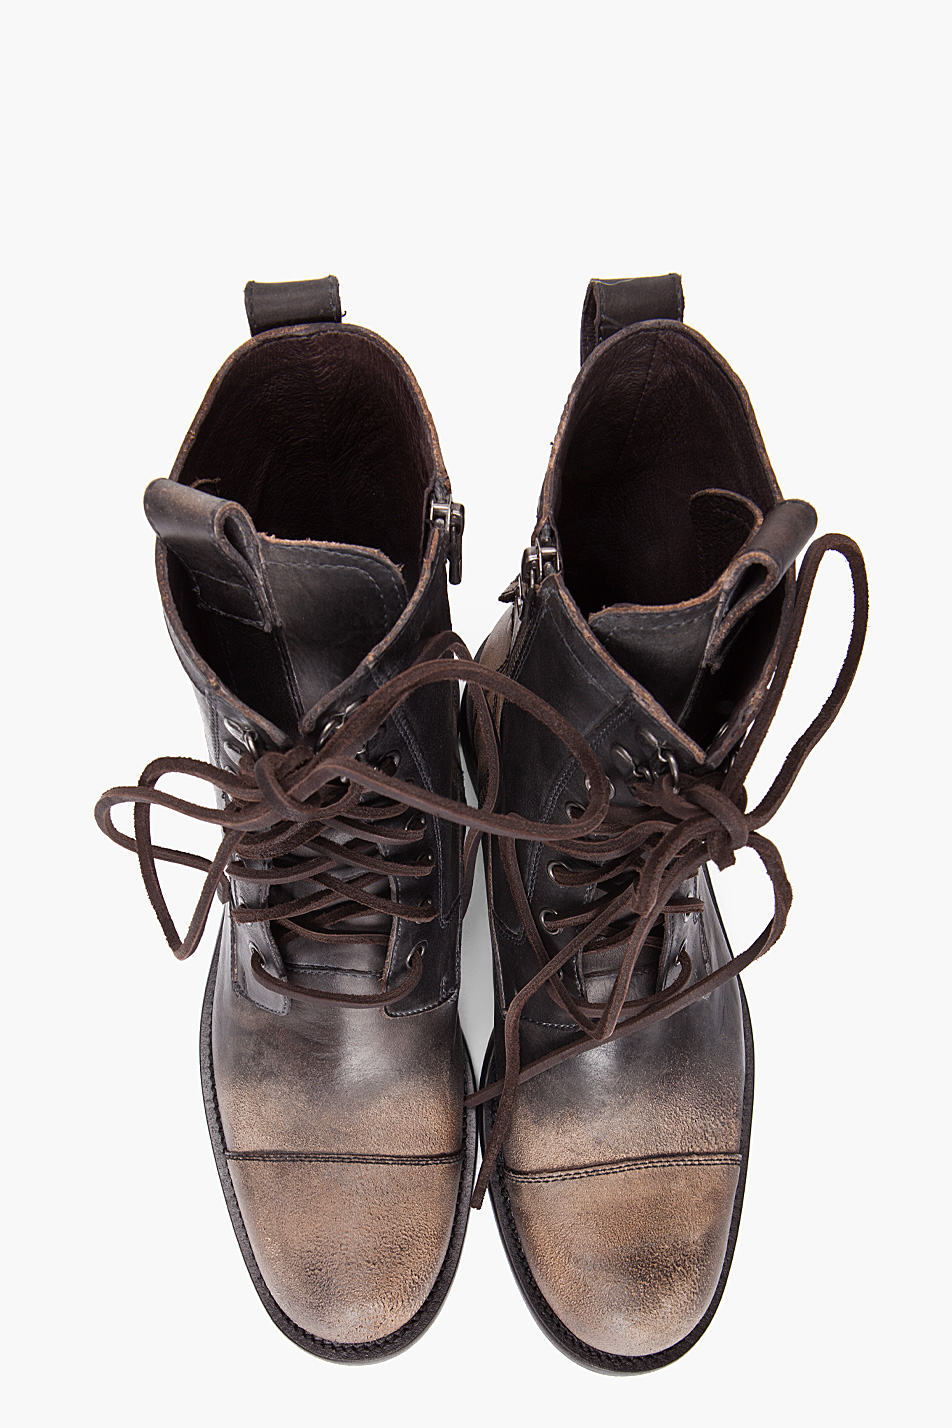 6c40c25cba John Varvatos Combat Boots in Brown for Men - Lyst